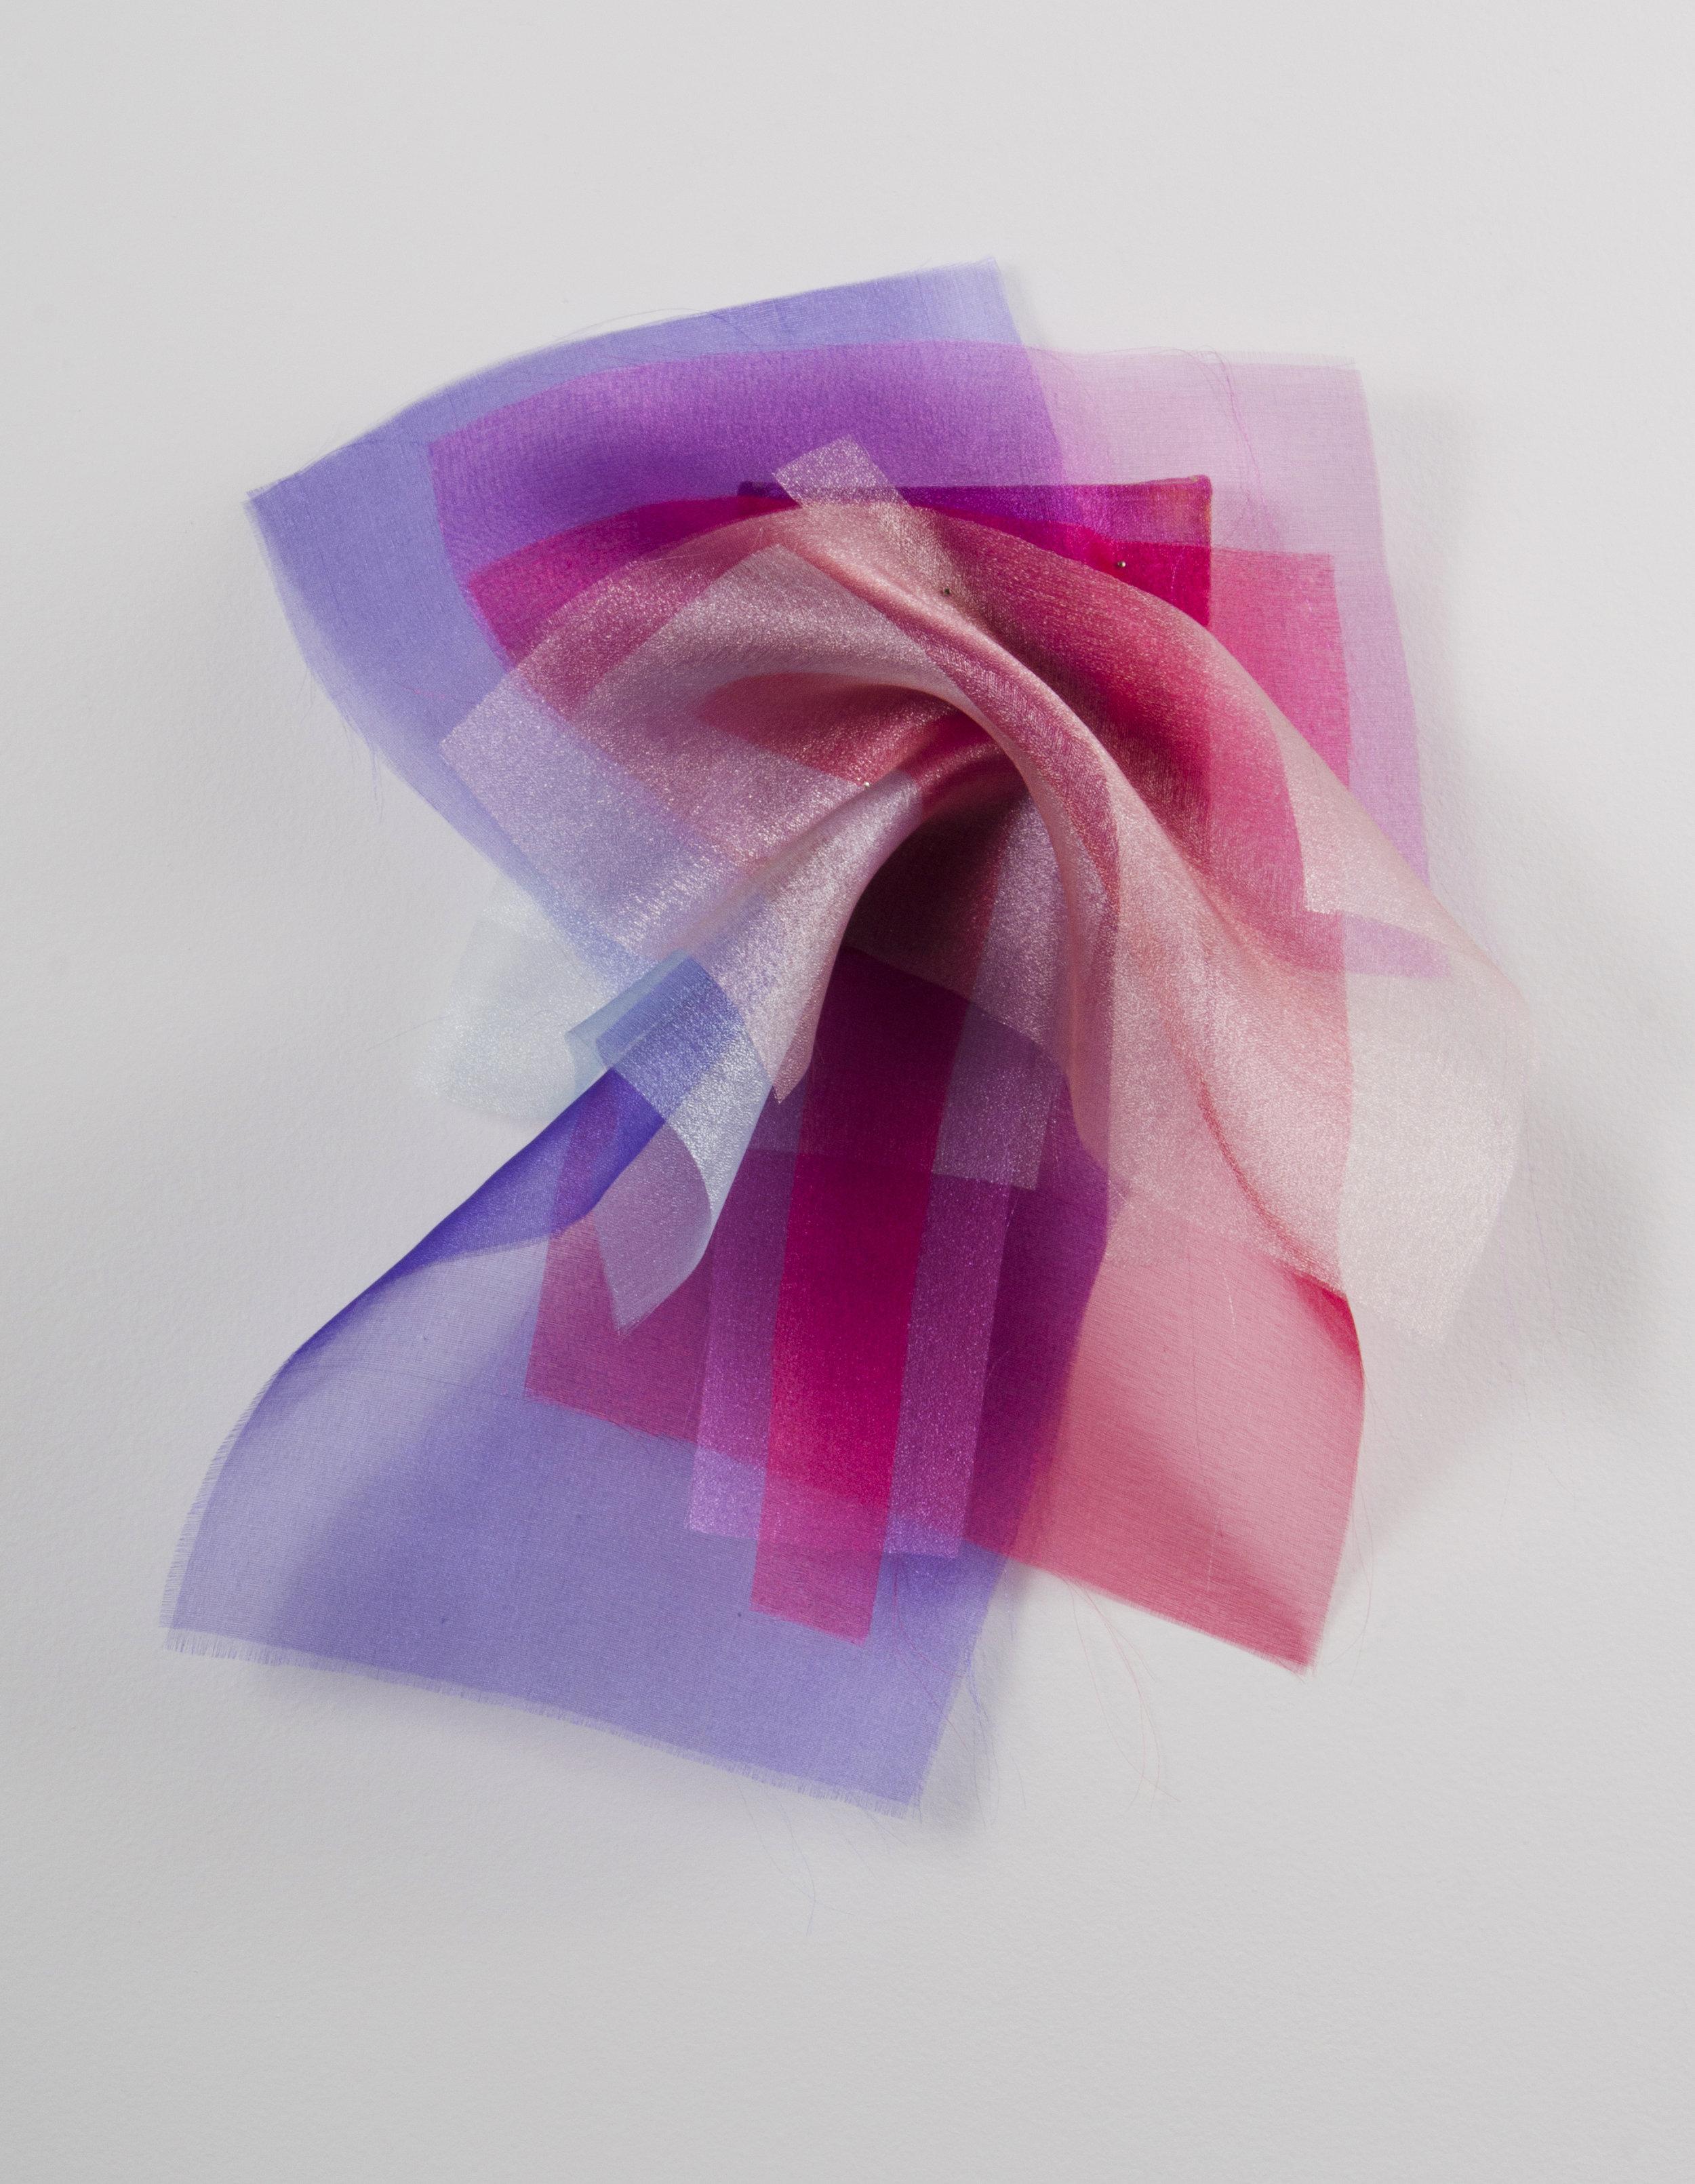 ledbetter_kirsten_pink_and_purple_push.jpg